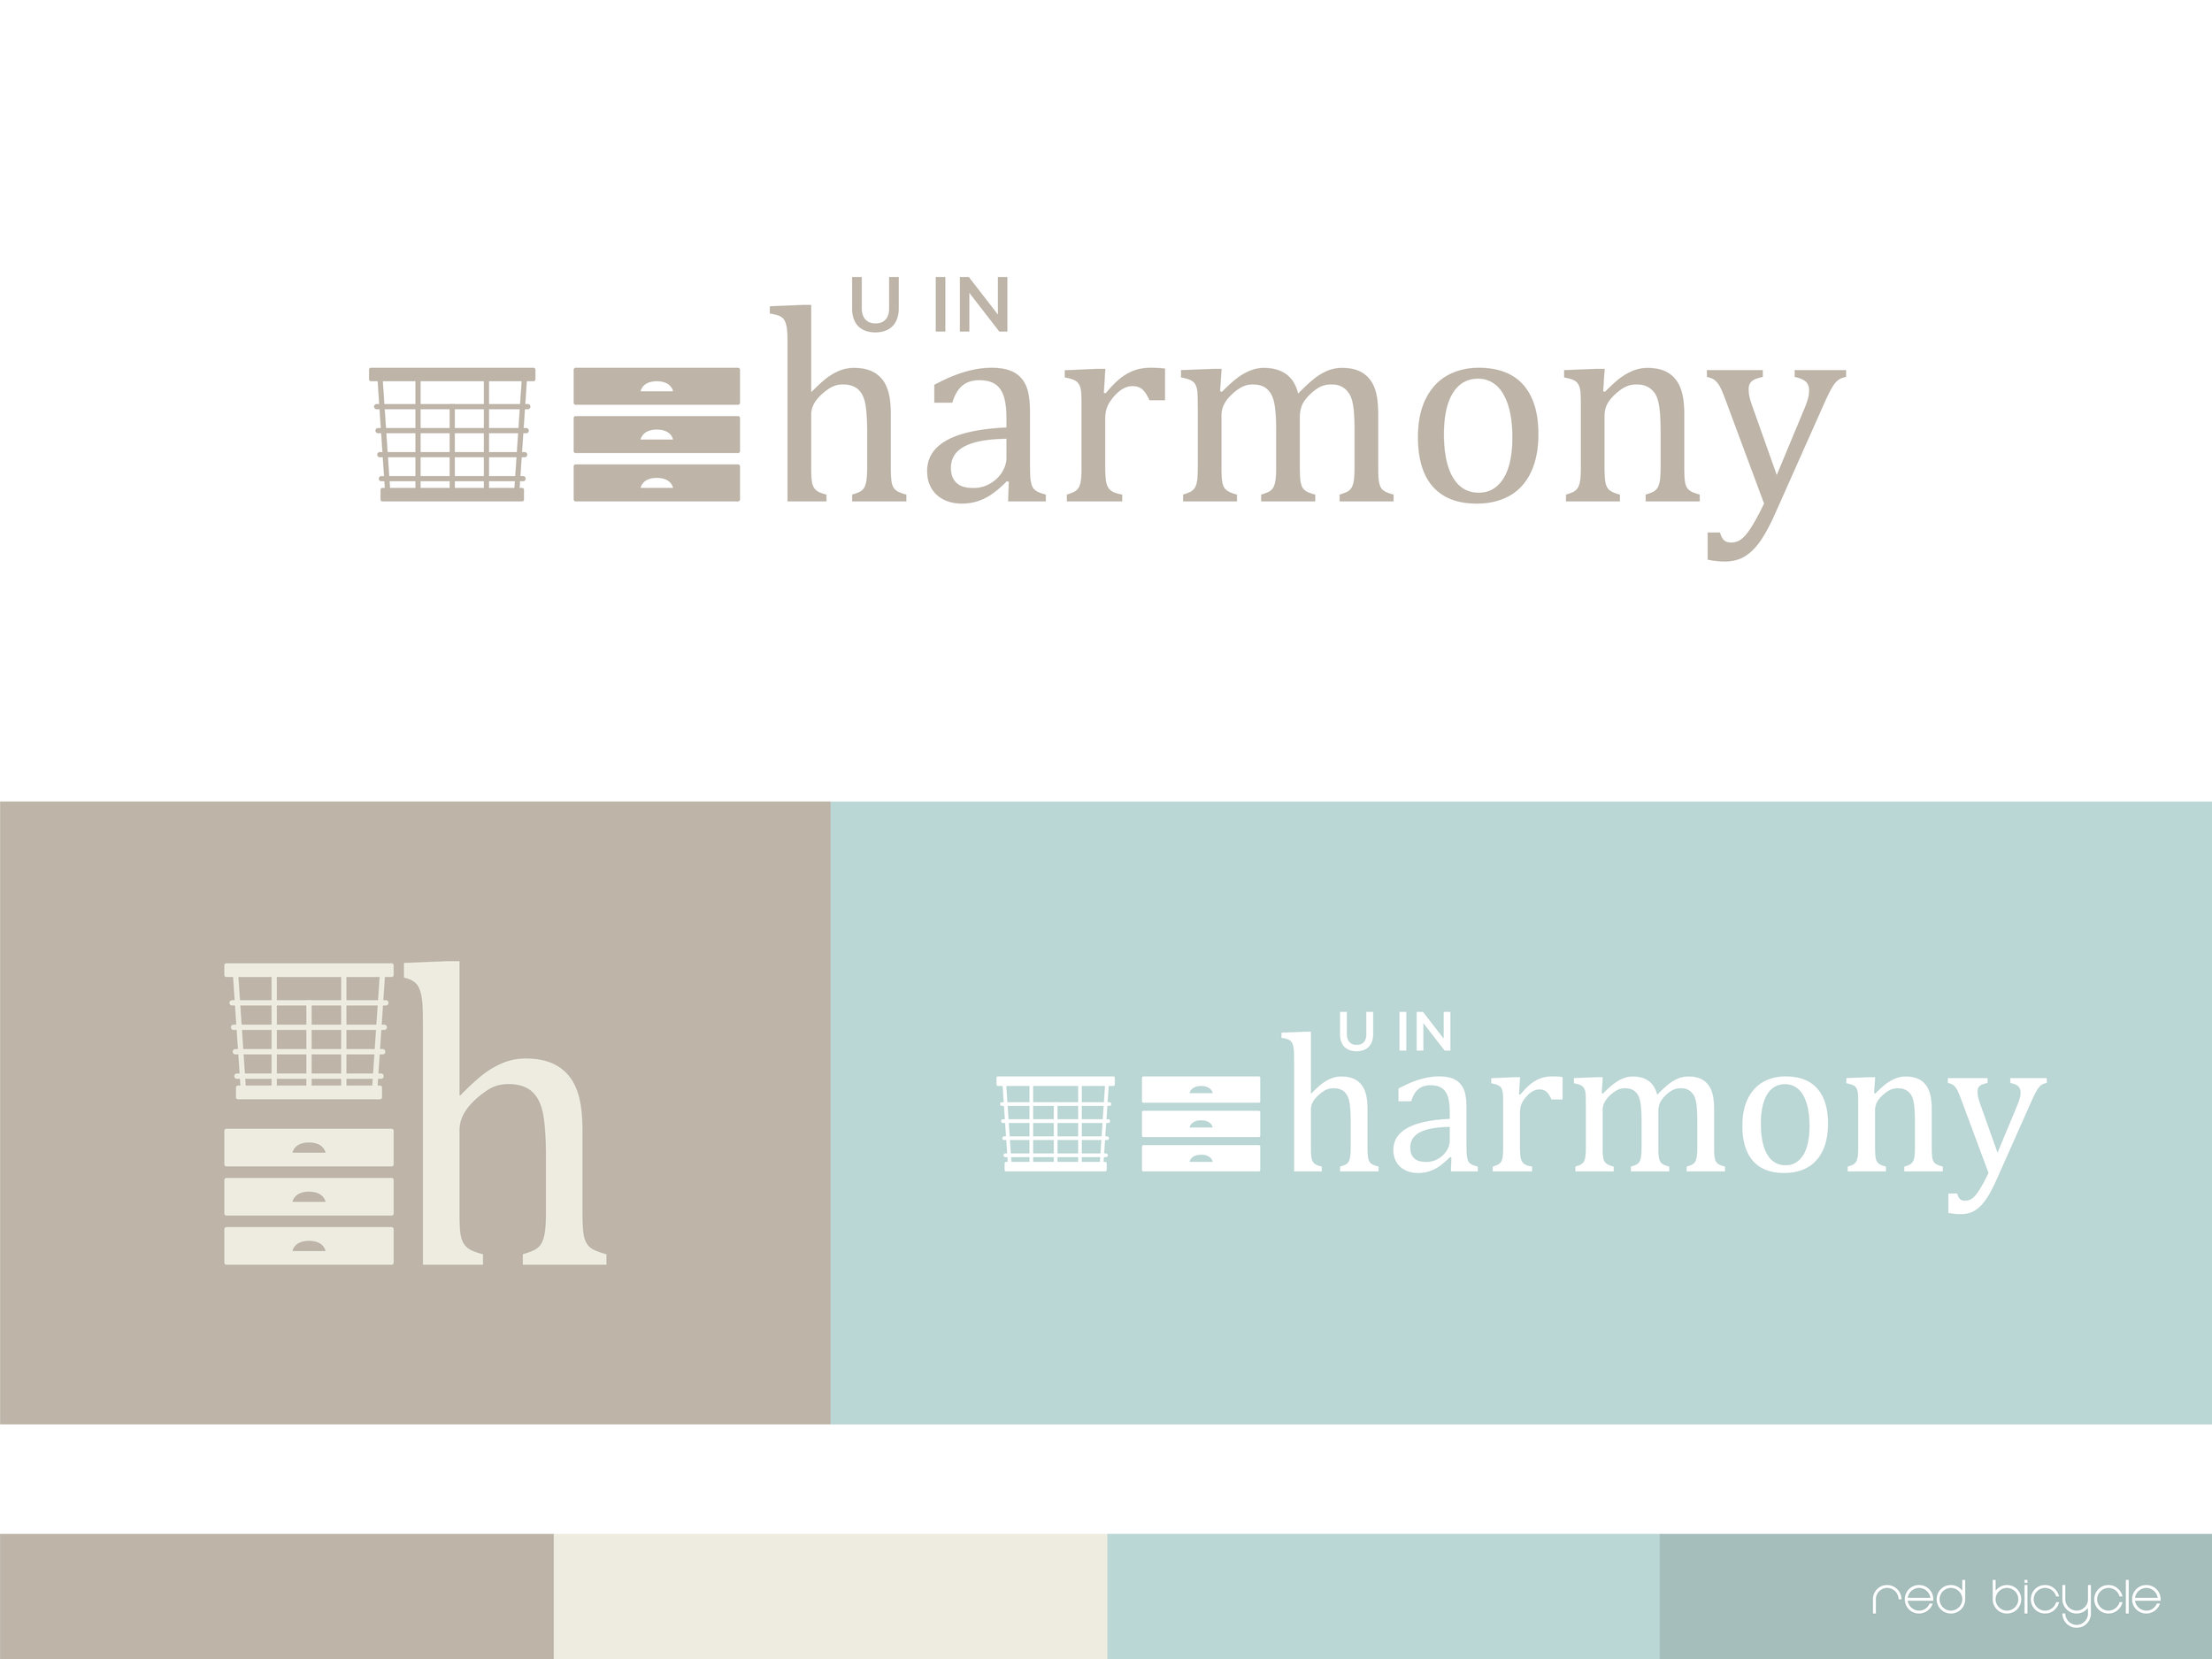 uinharmony-logo-01.jpg